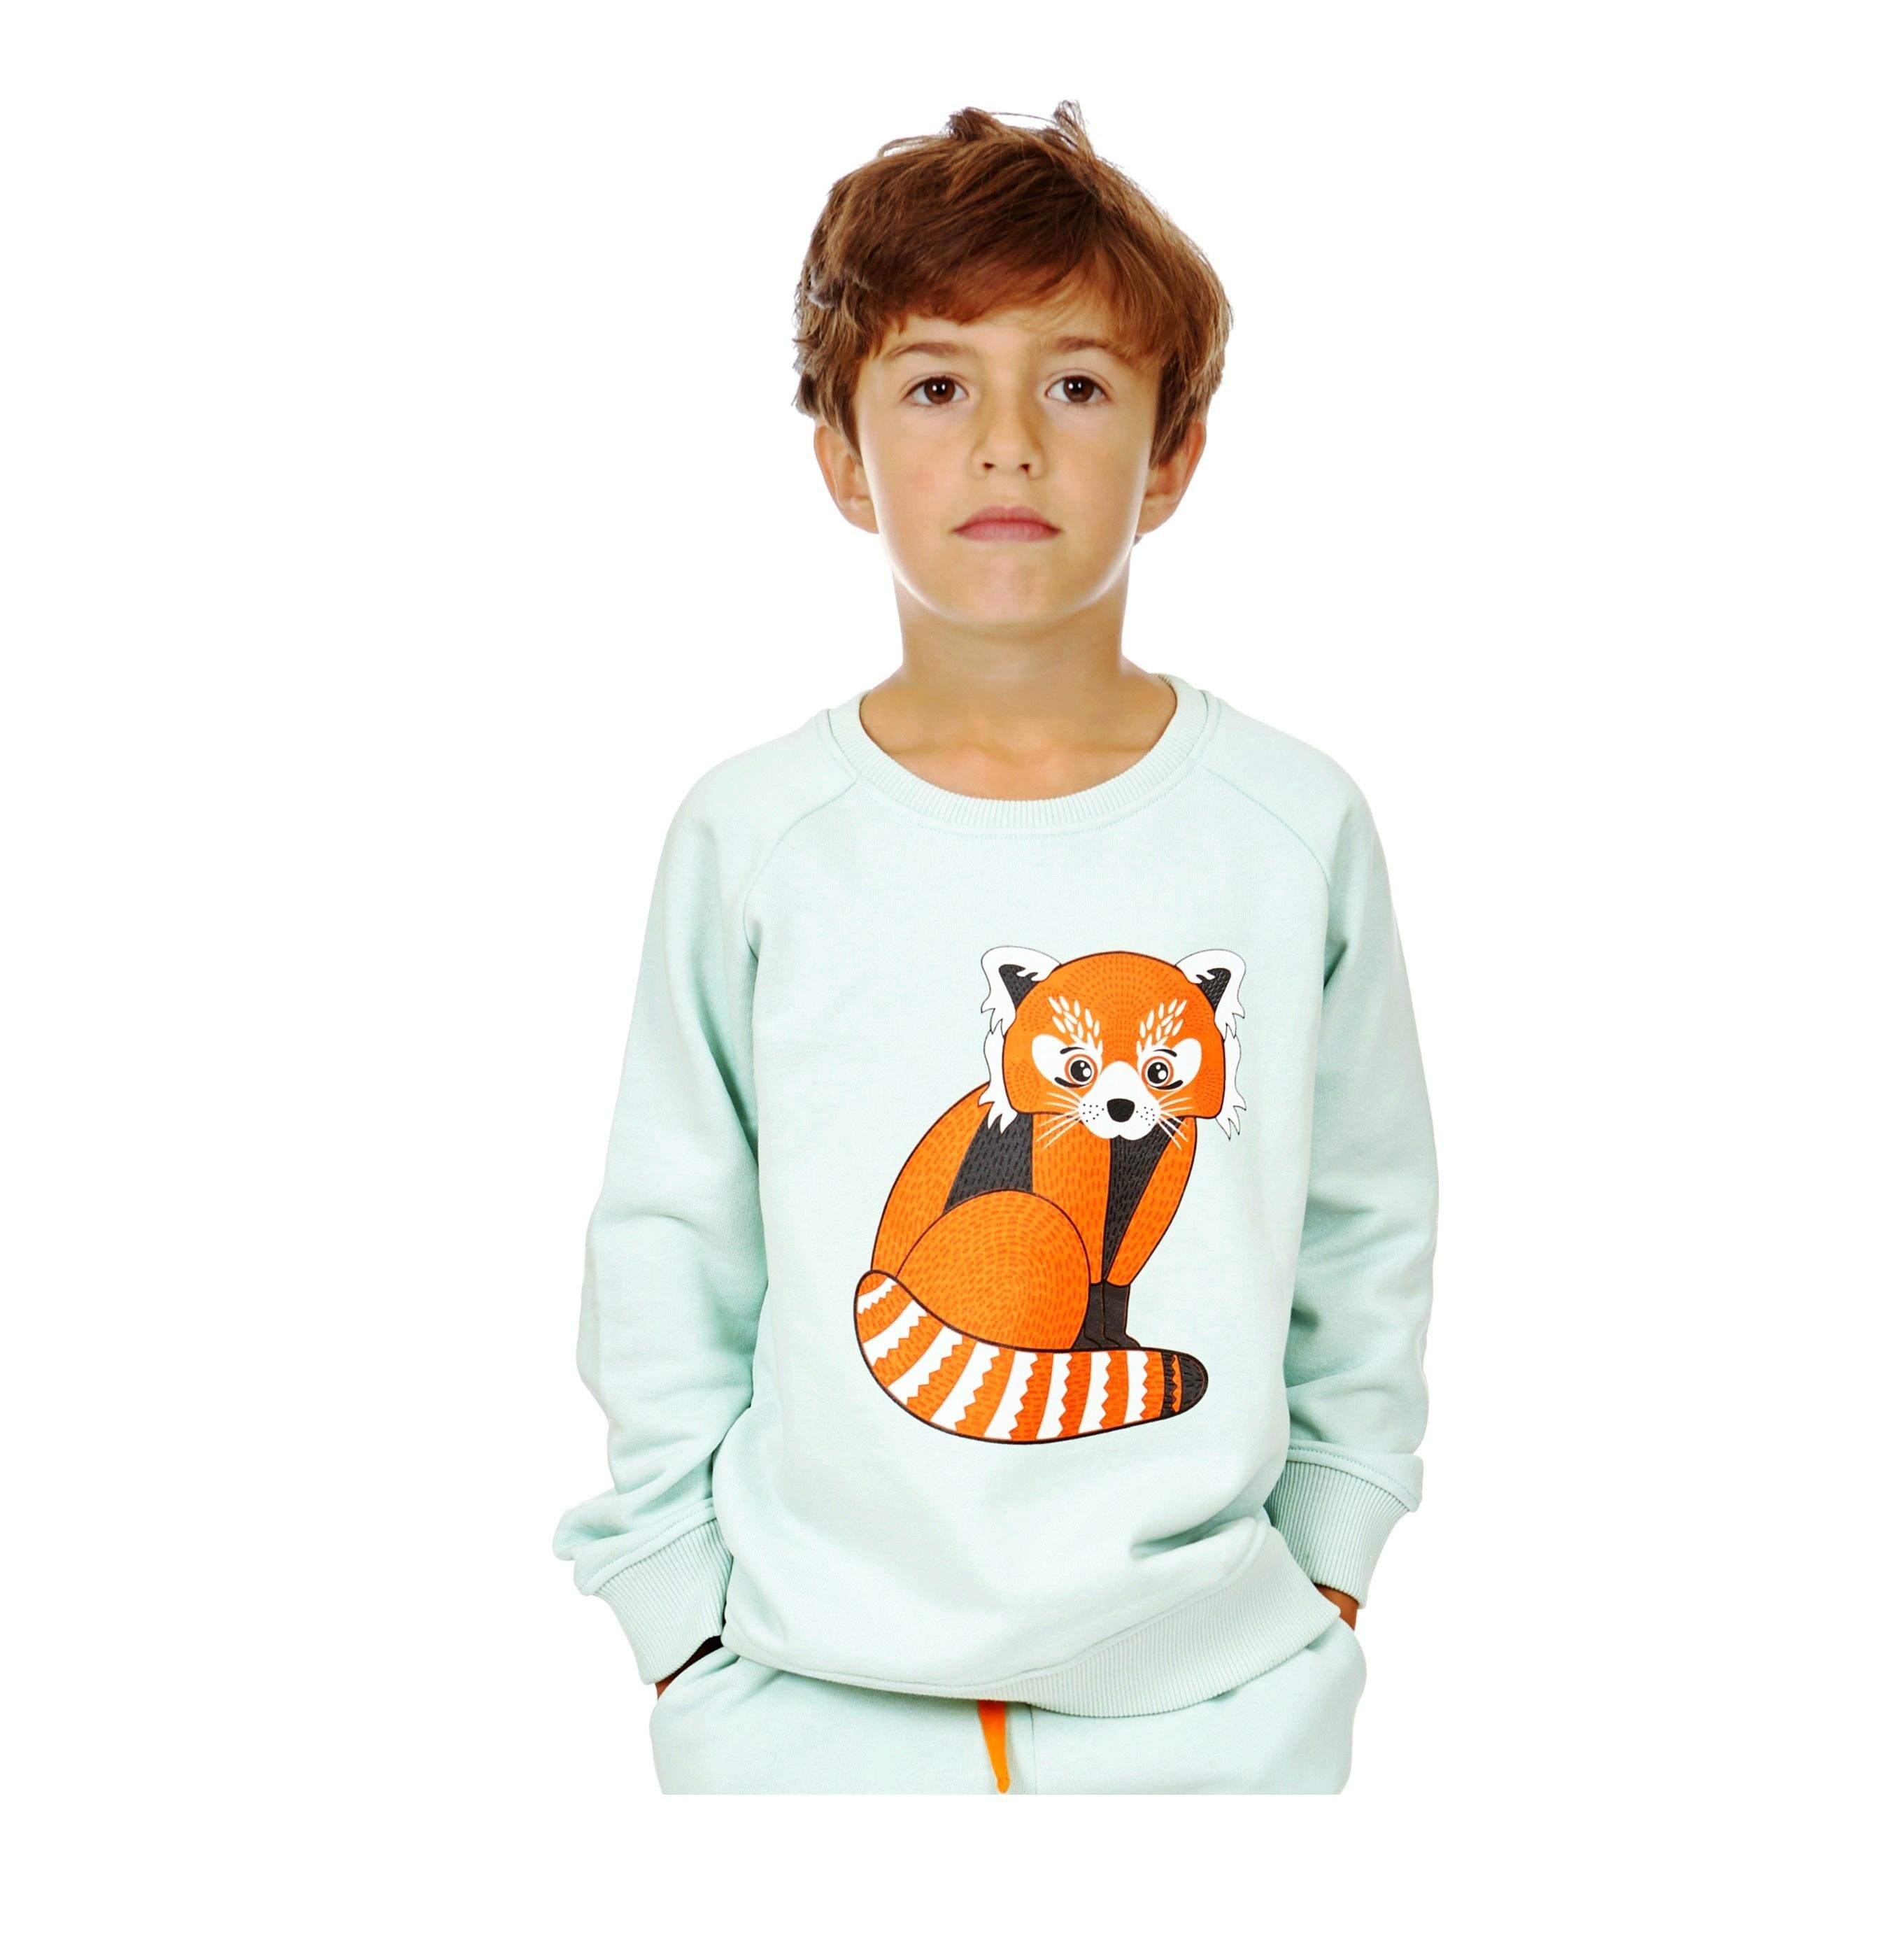 Sweatshirt Red Panda 2